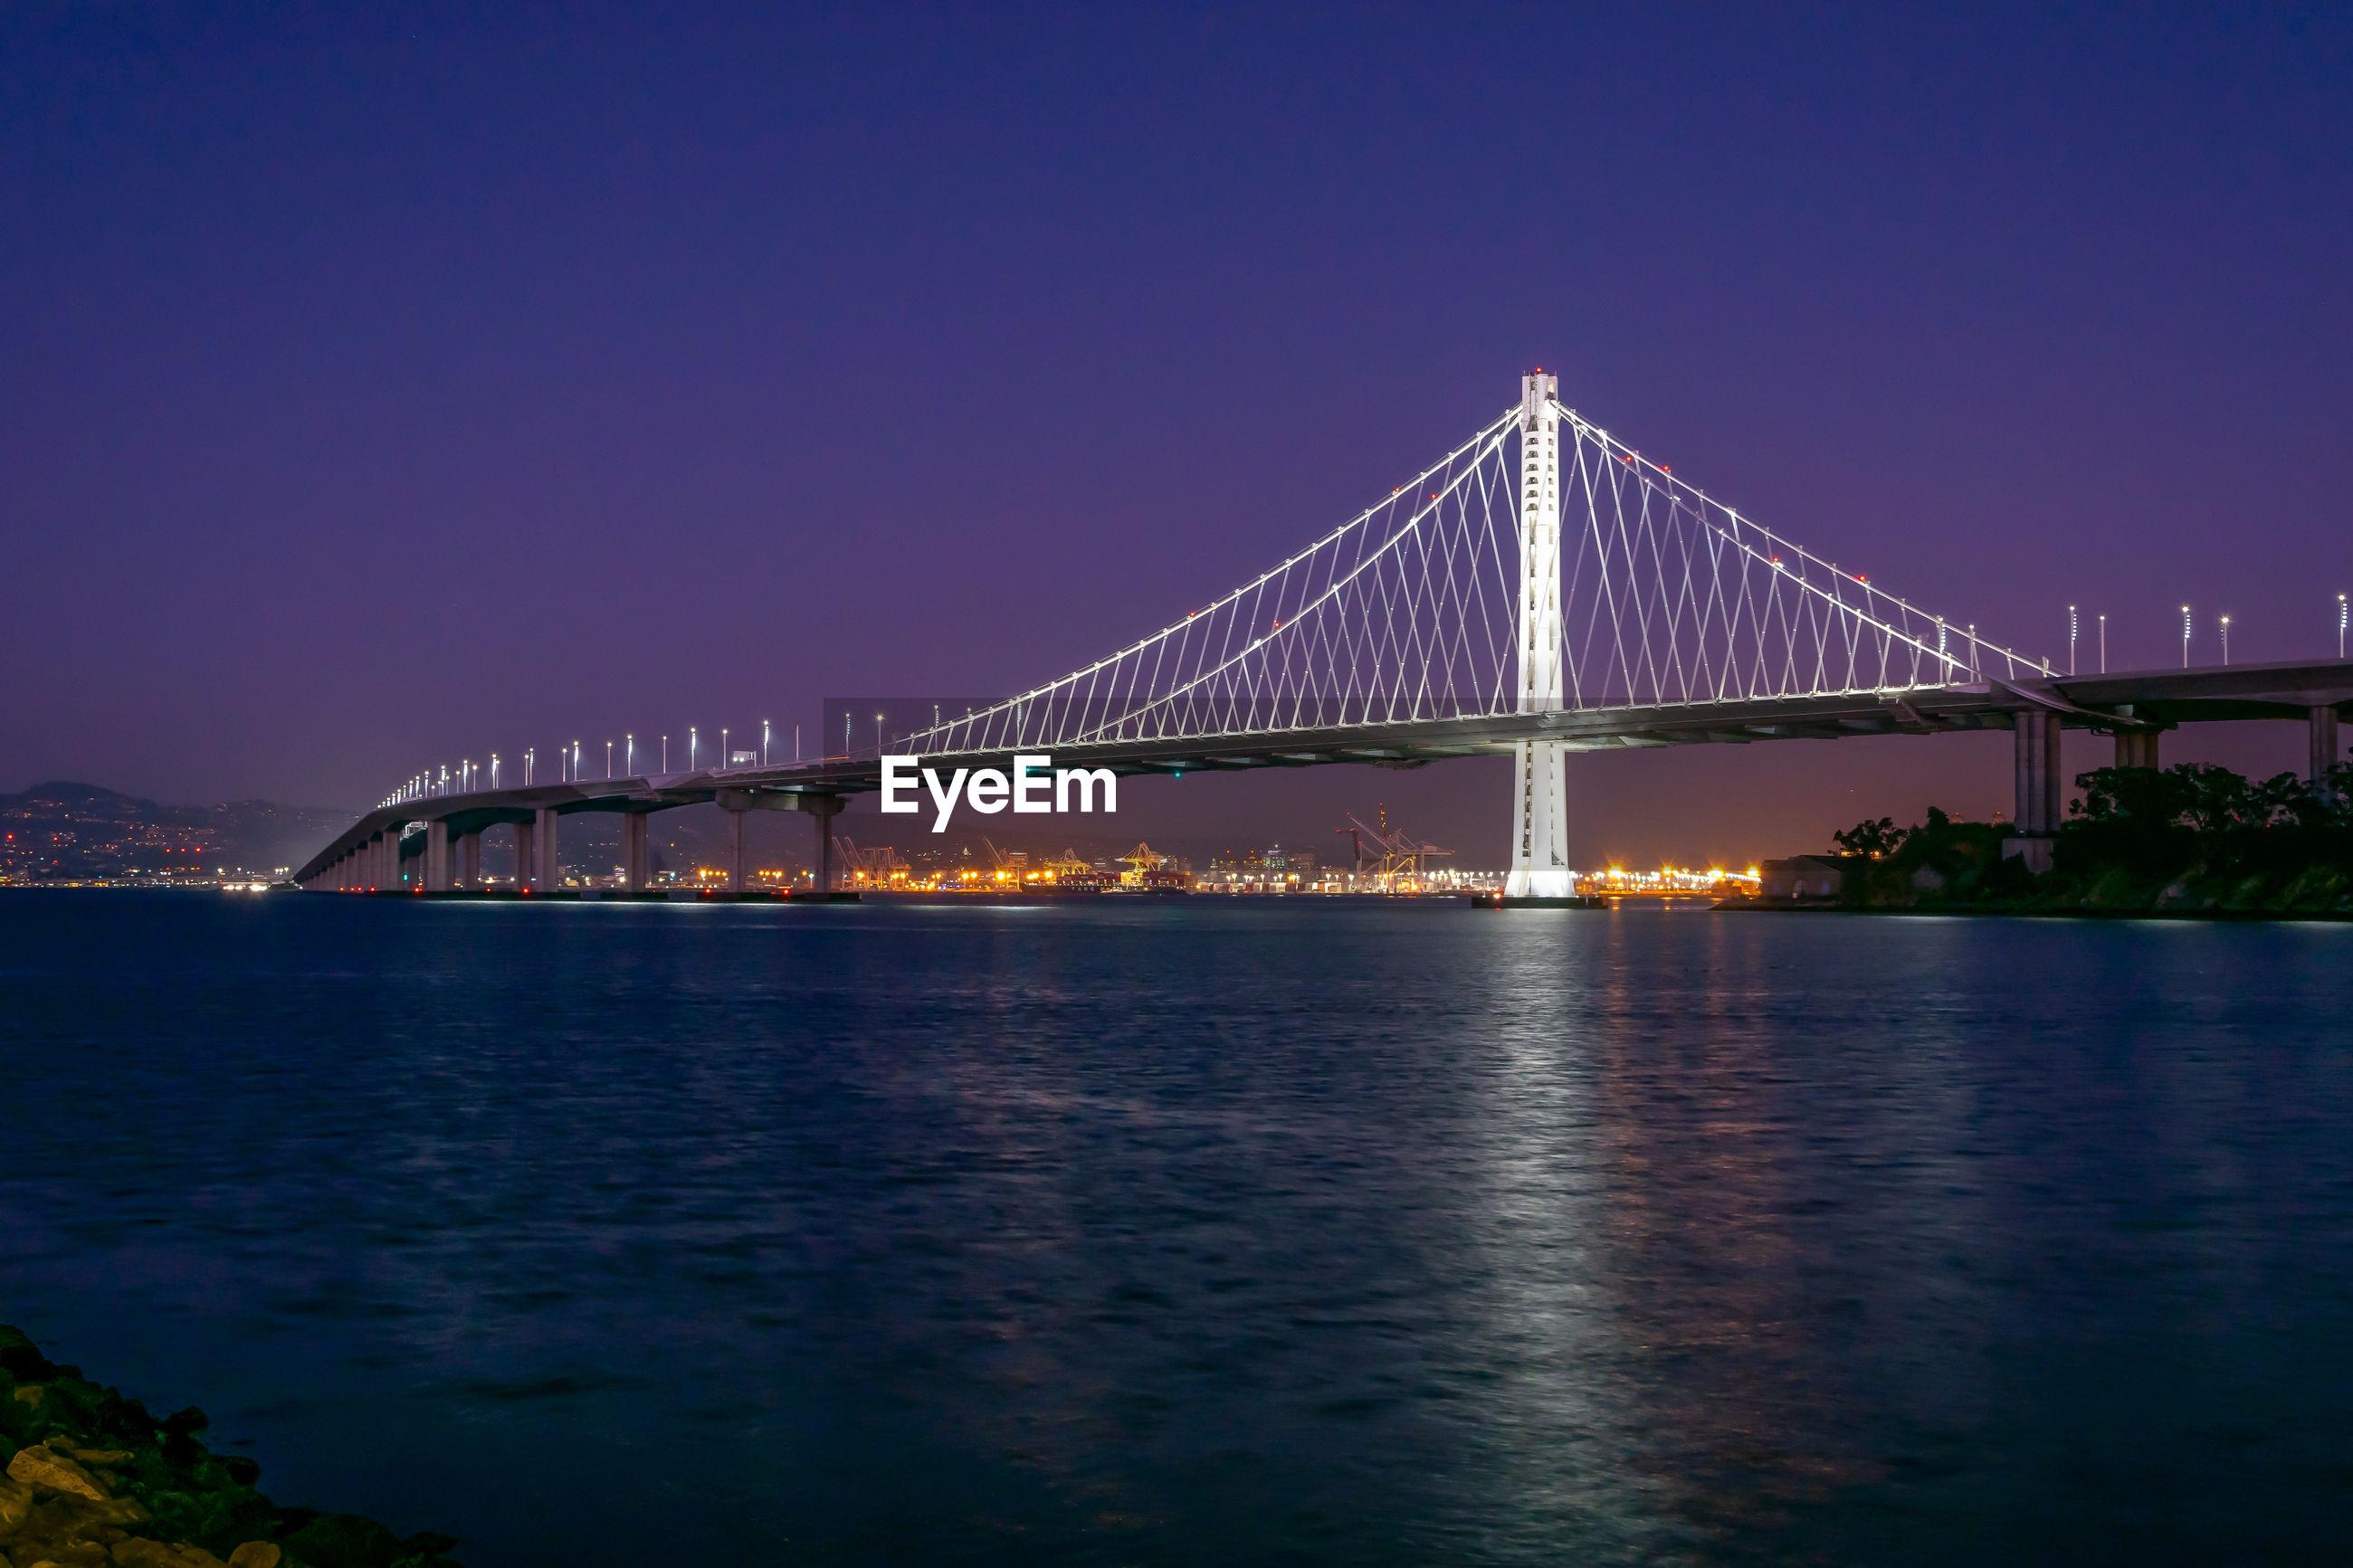 Bridge over calm river at night